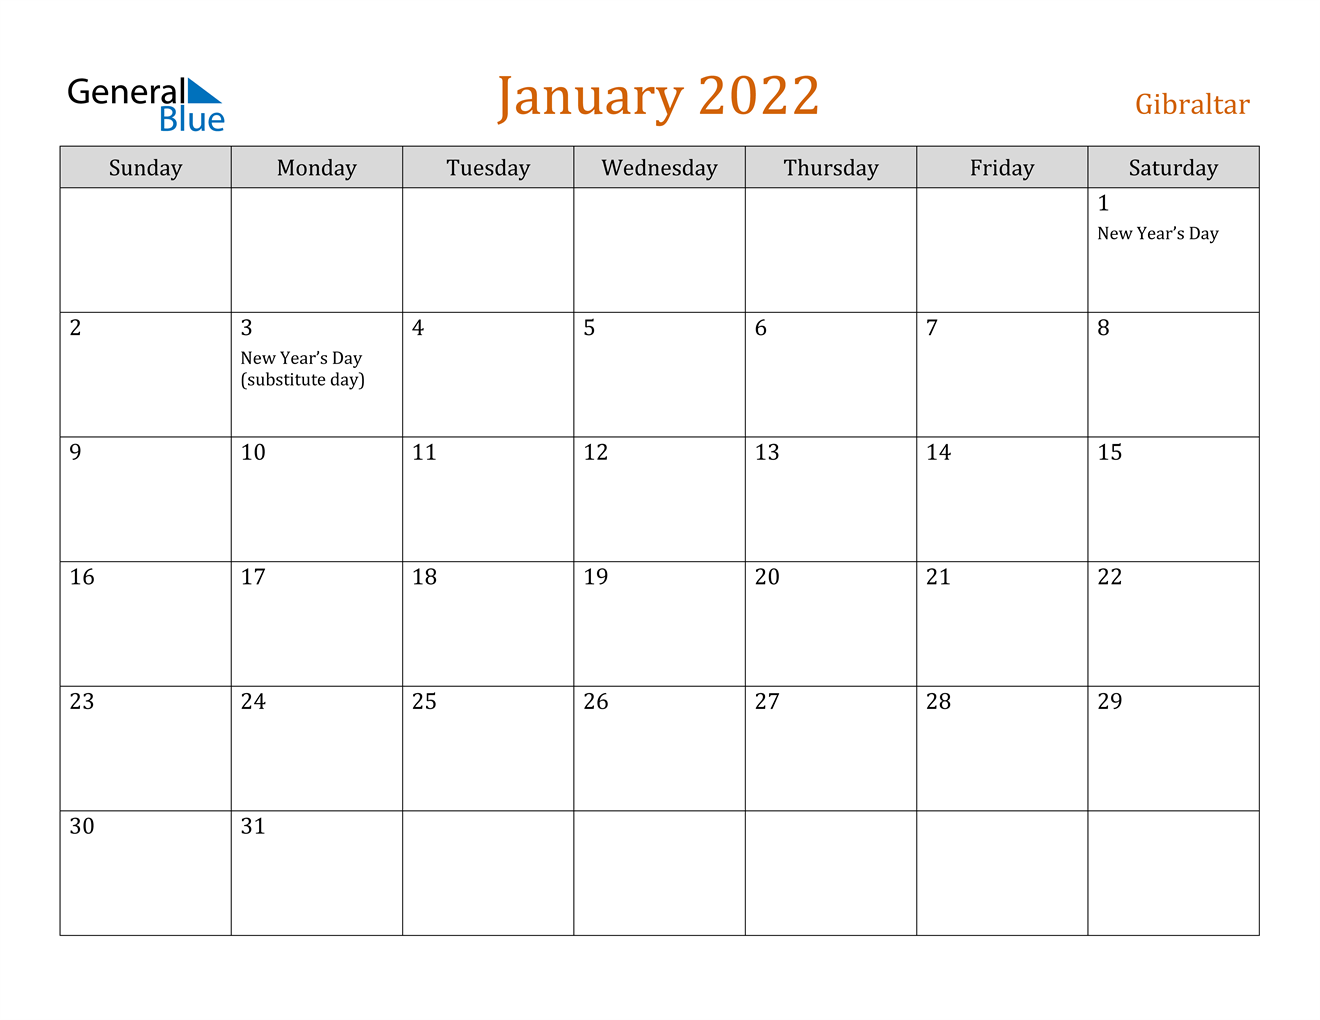 January 2022 Calendar - Gibraltar